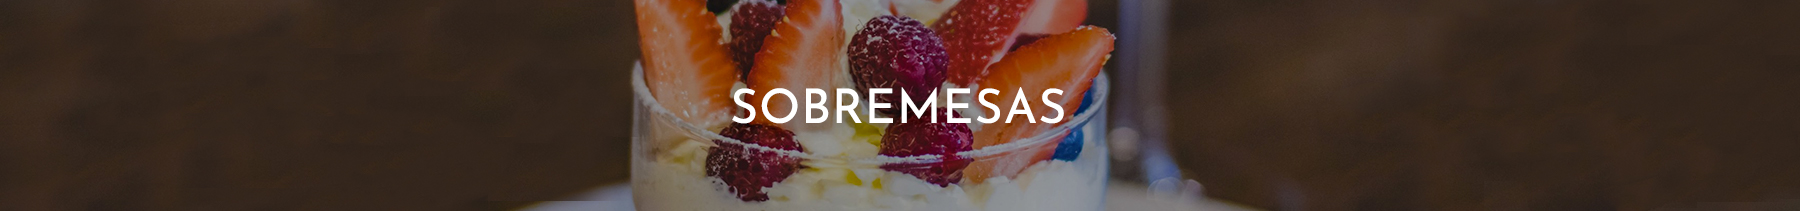 Banner Sobremesas